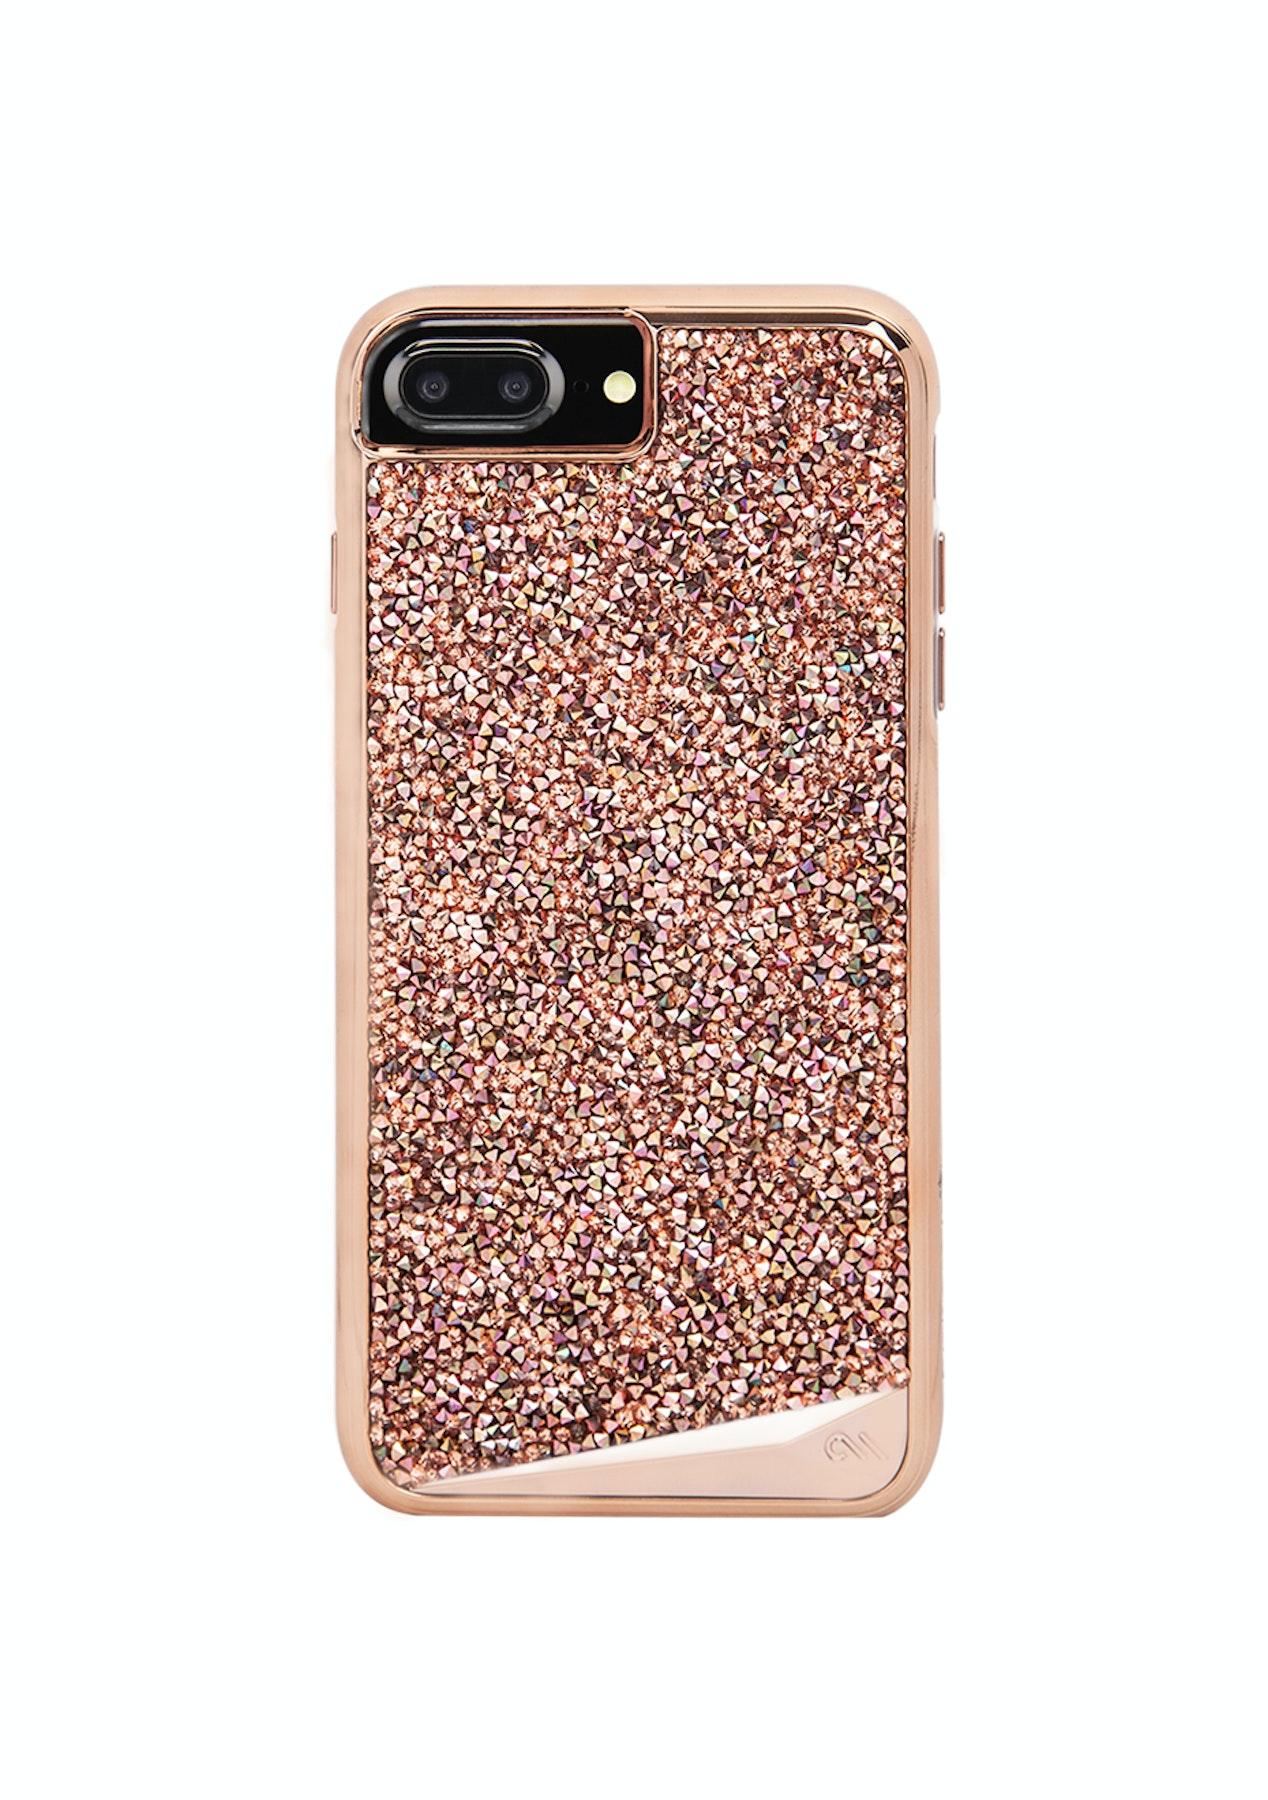 timeless design 08d13 48ddd Case-mate Apple iPhone 8 Plus / 7 Plus / 6S Plus - Brilliance Case - Rose  Gold